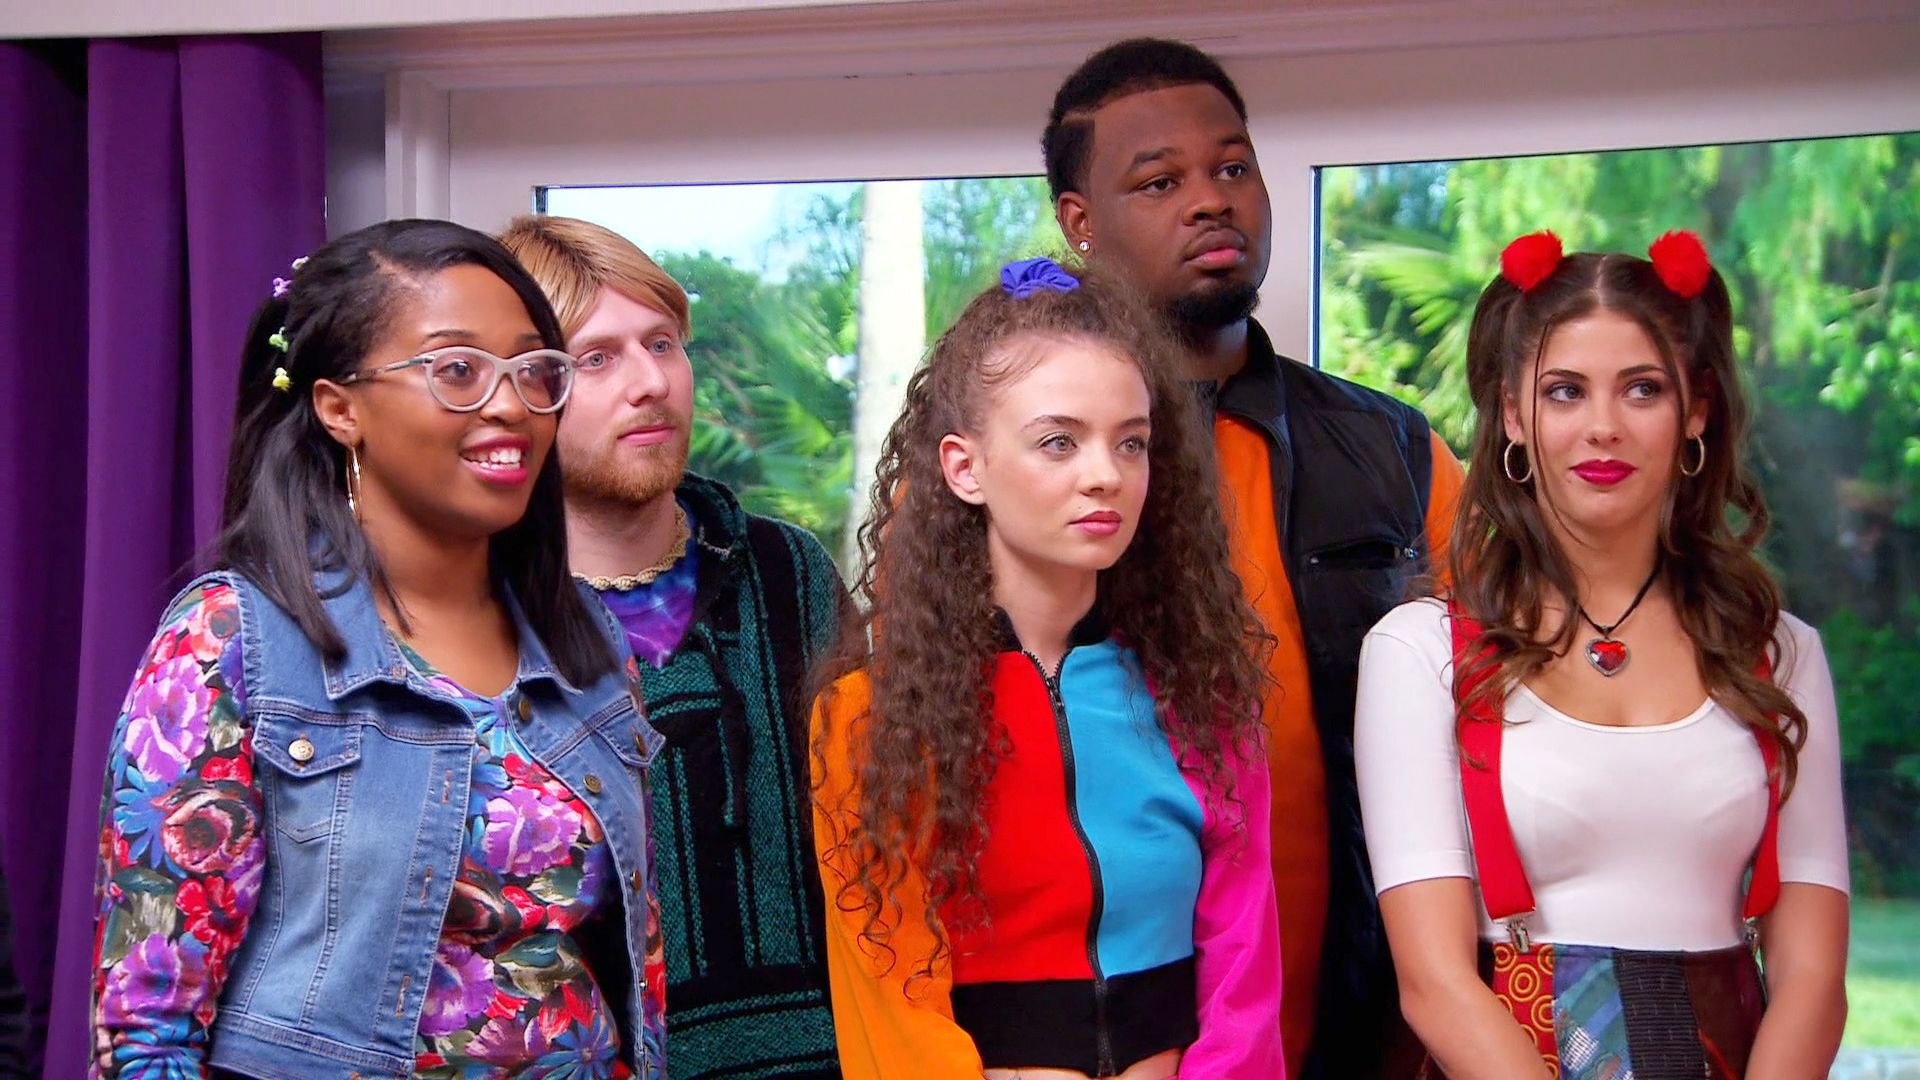 90u0027s House   Season 1, Ep. 1   Welcome To The 90u0027s!   Full Episode | MTV